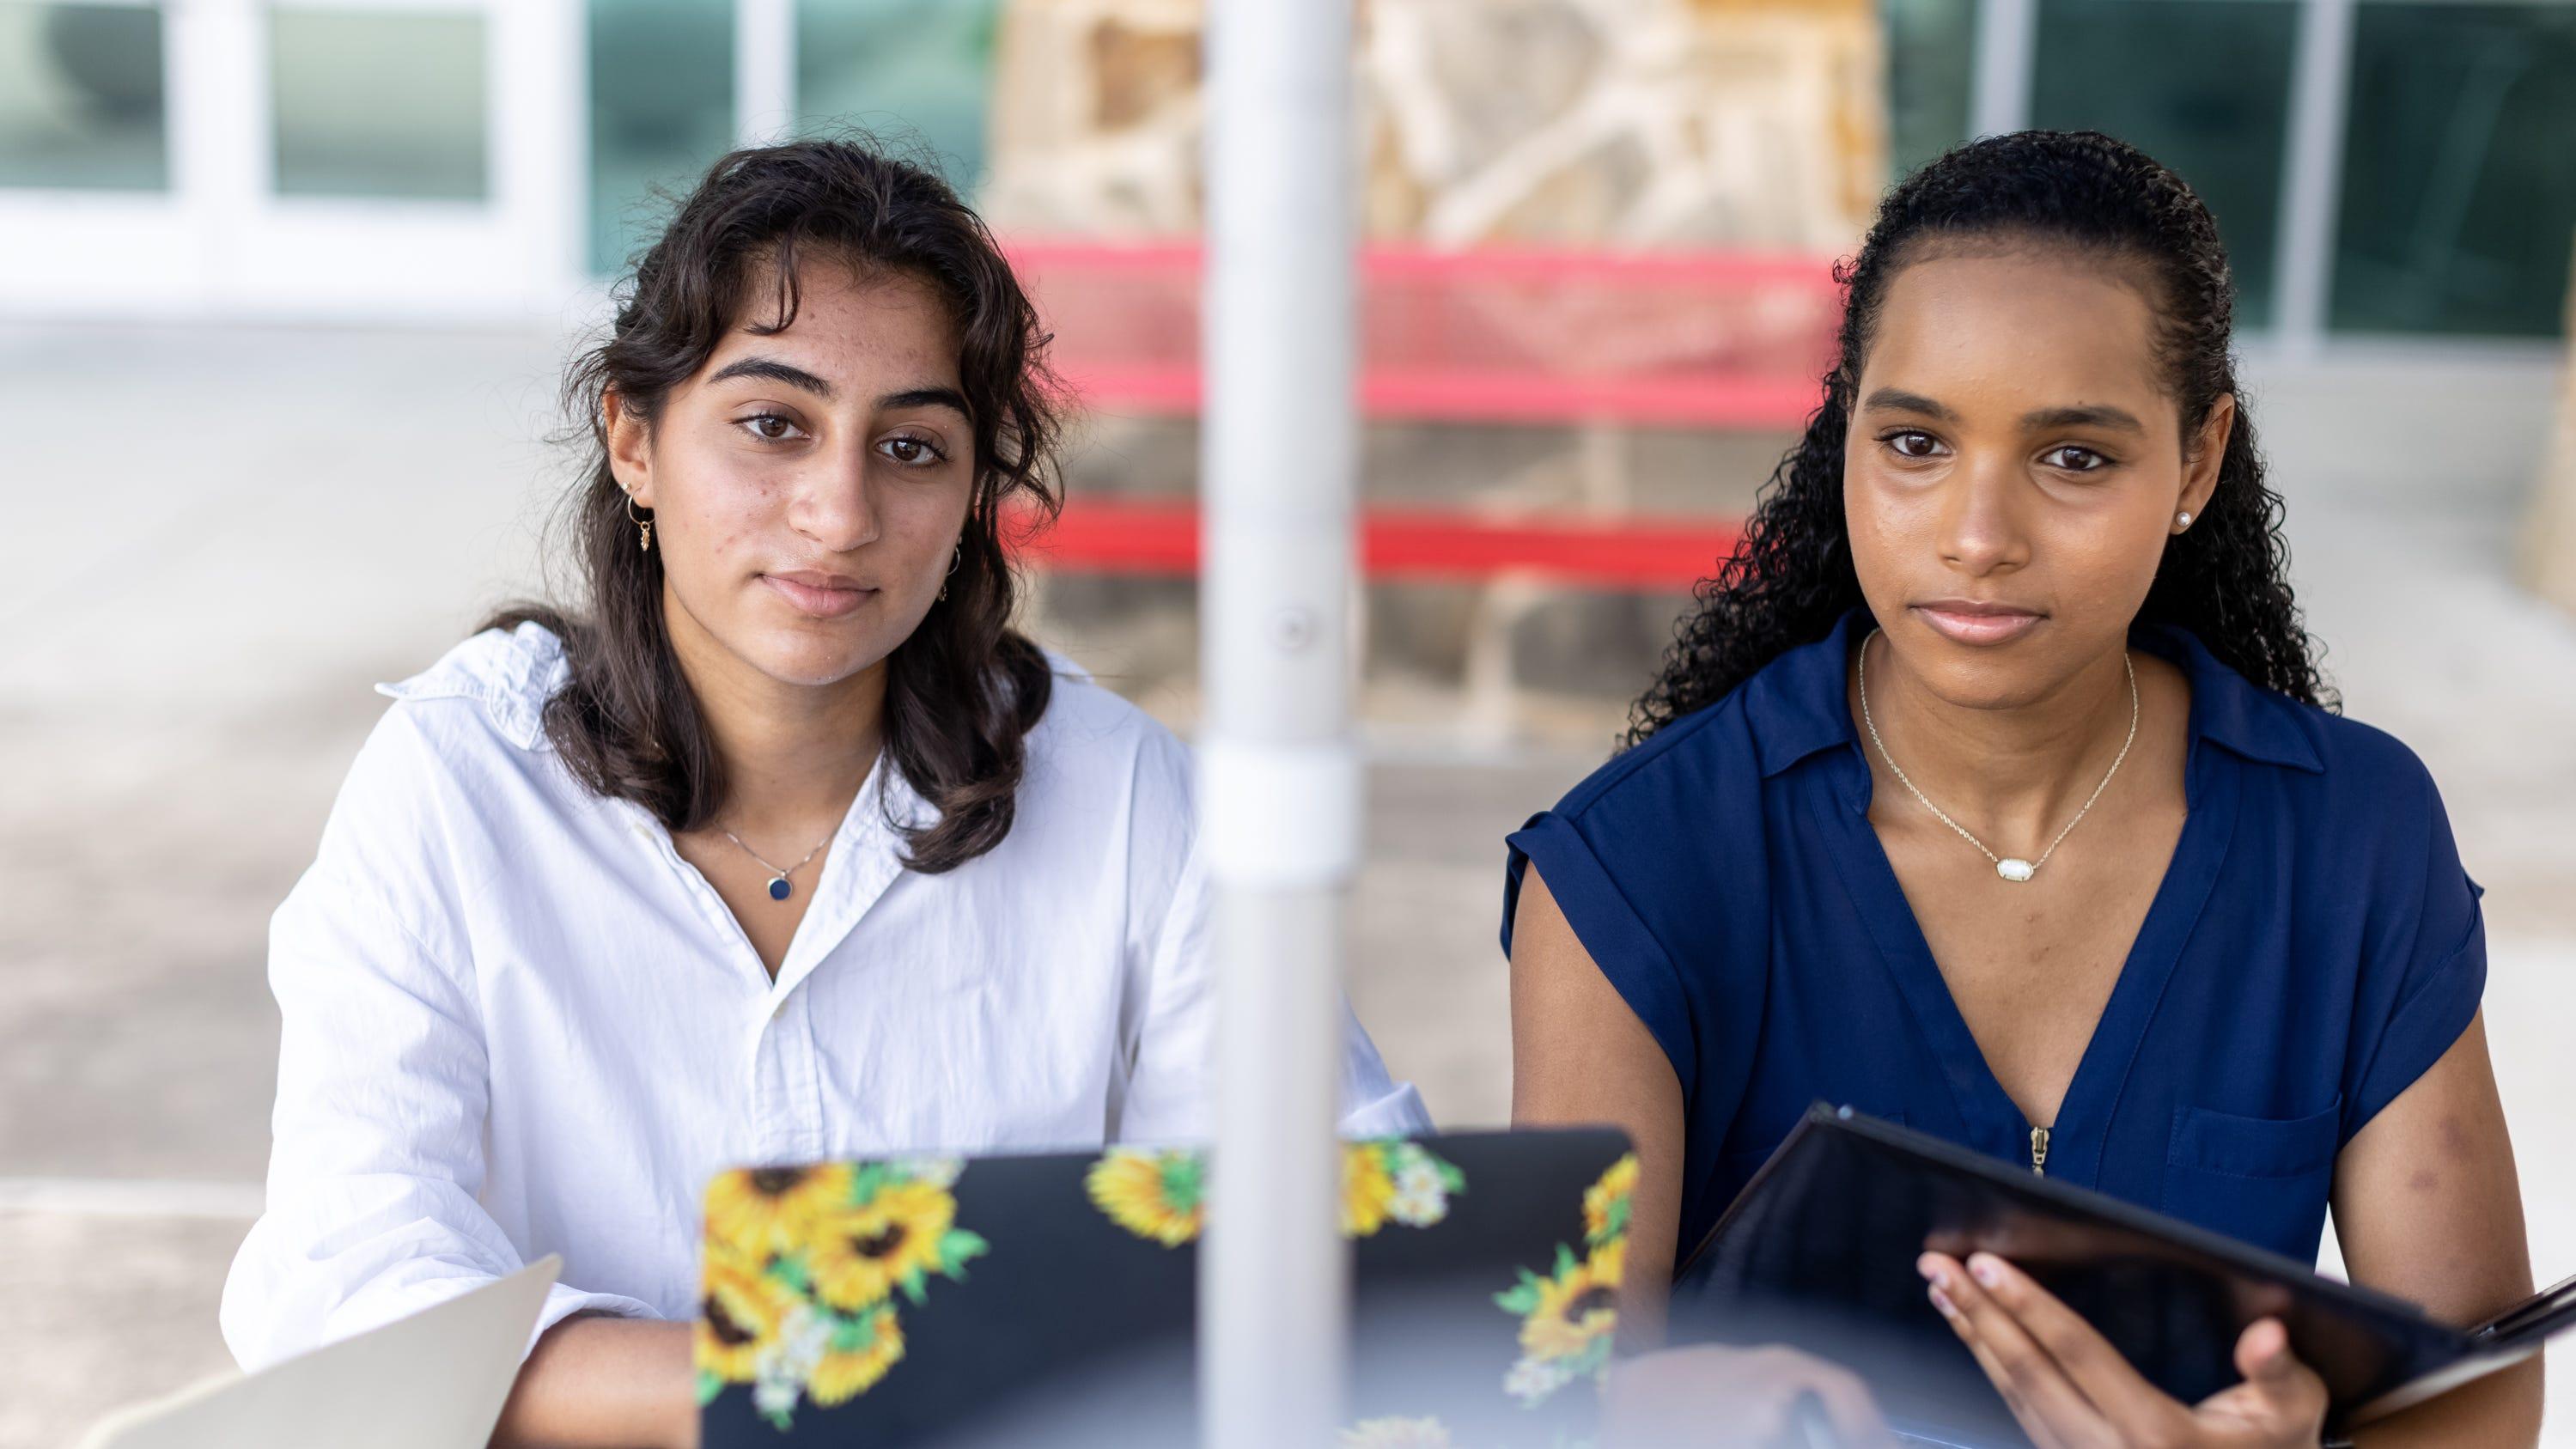 www.statesman.com: Westlake students turn to diversity work in their own way, despite community split over inclusion program